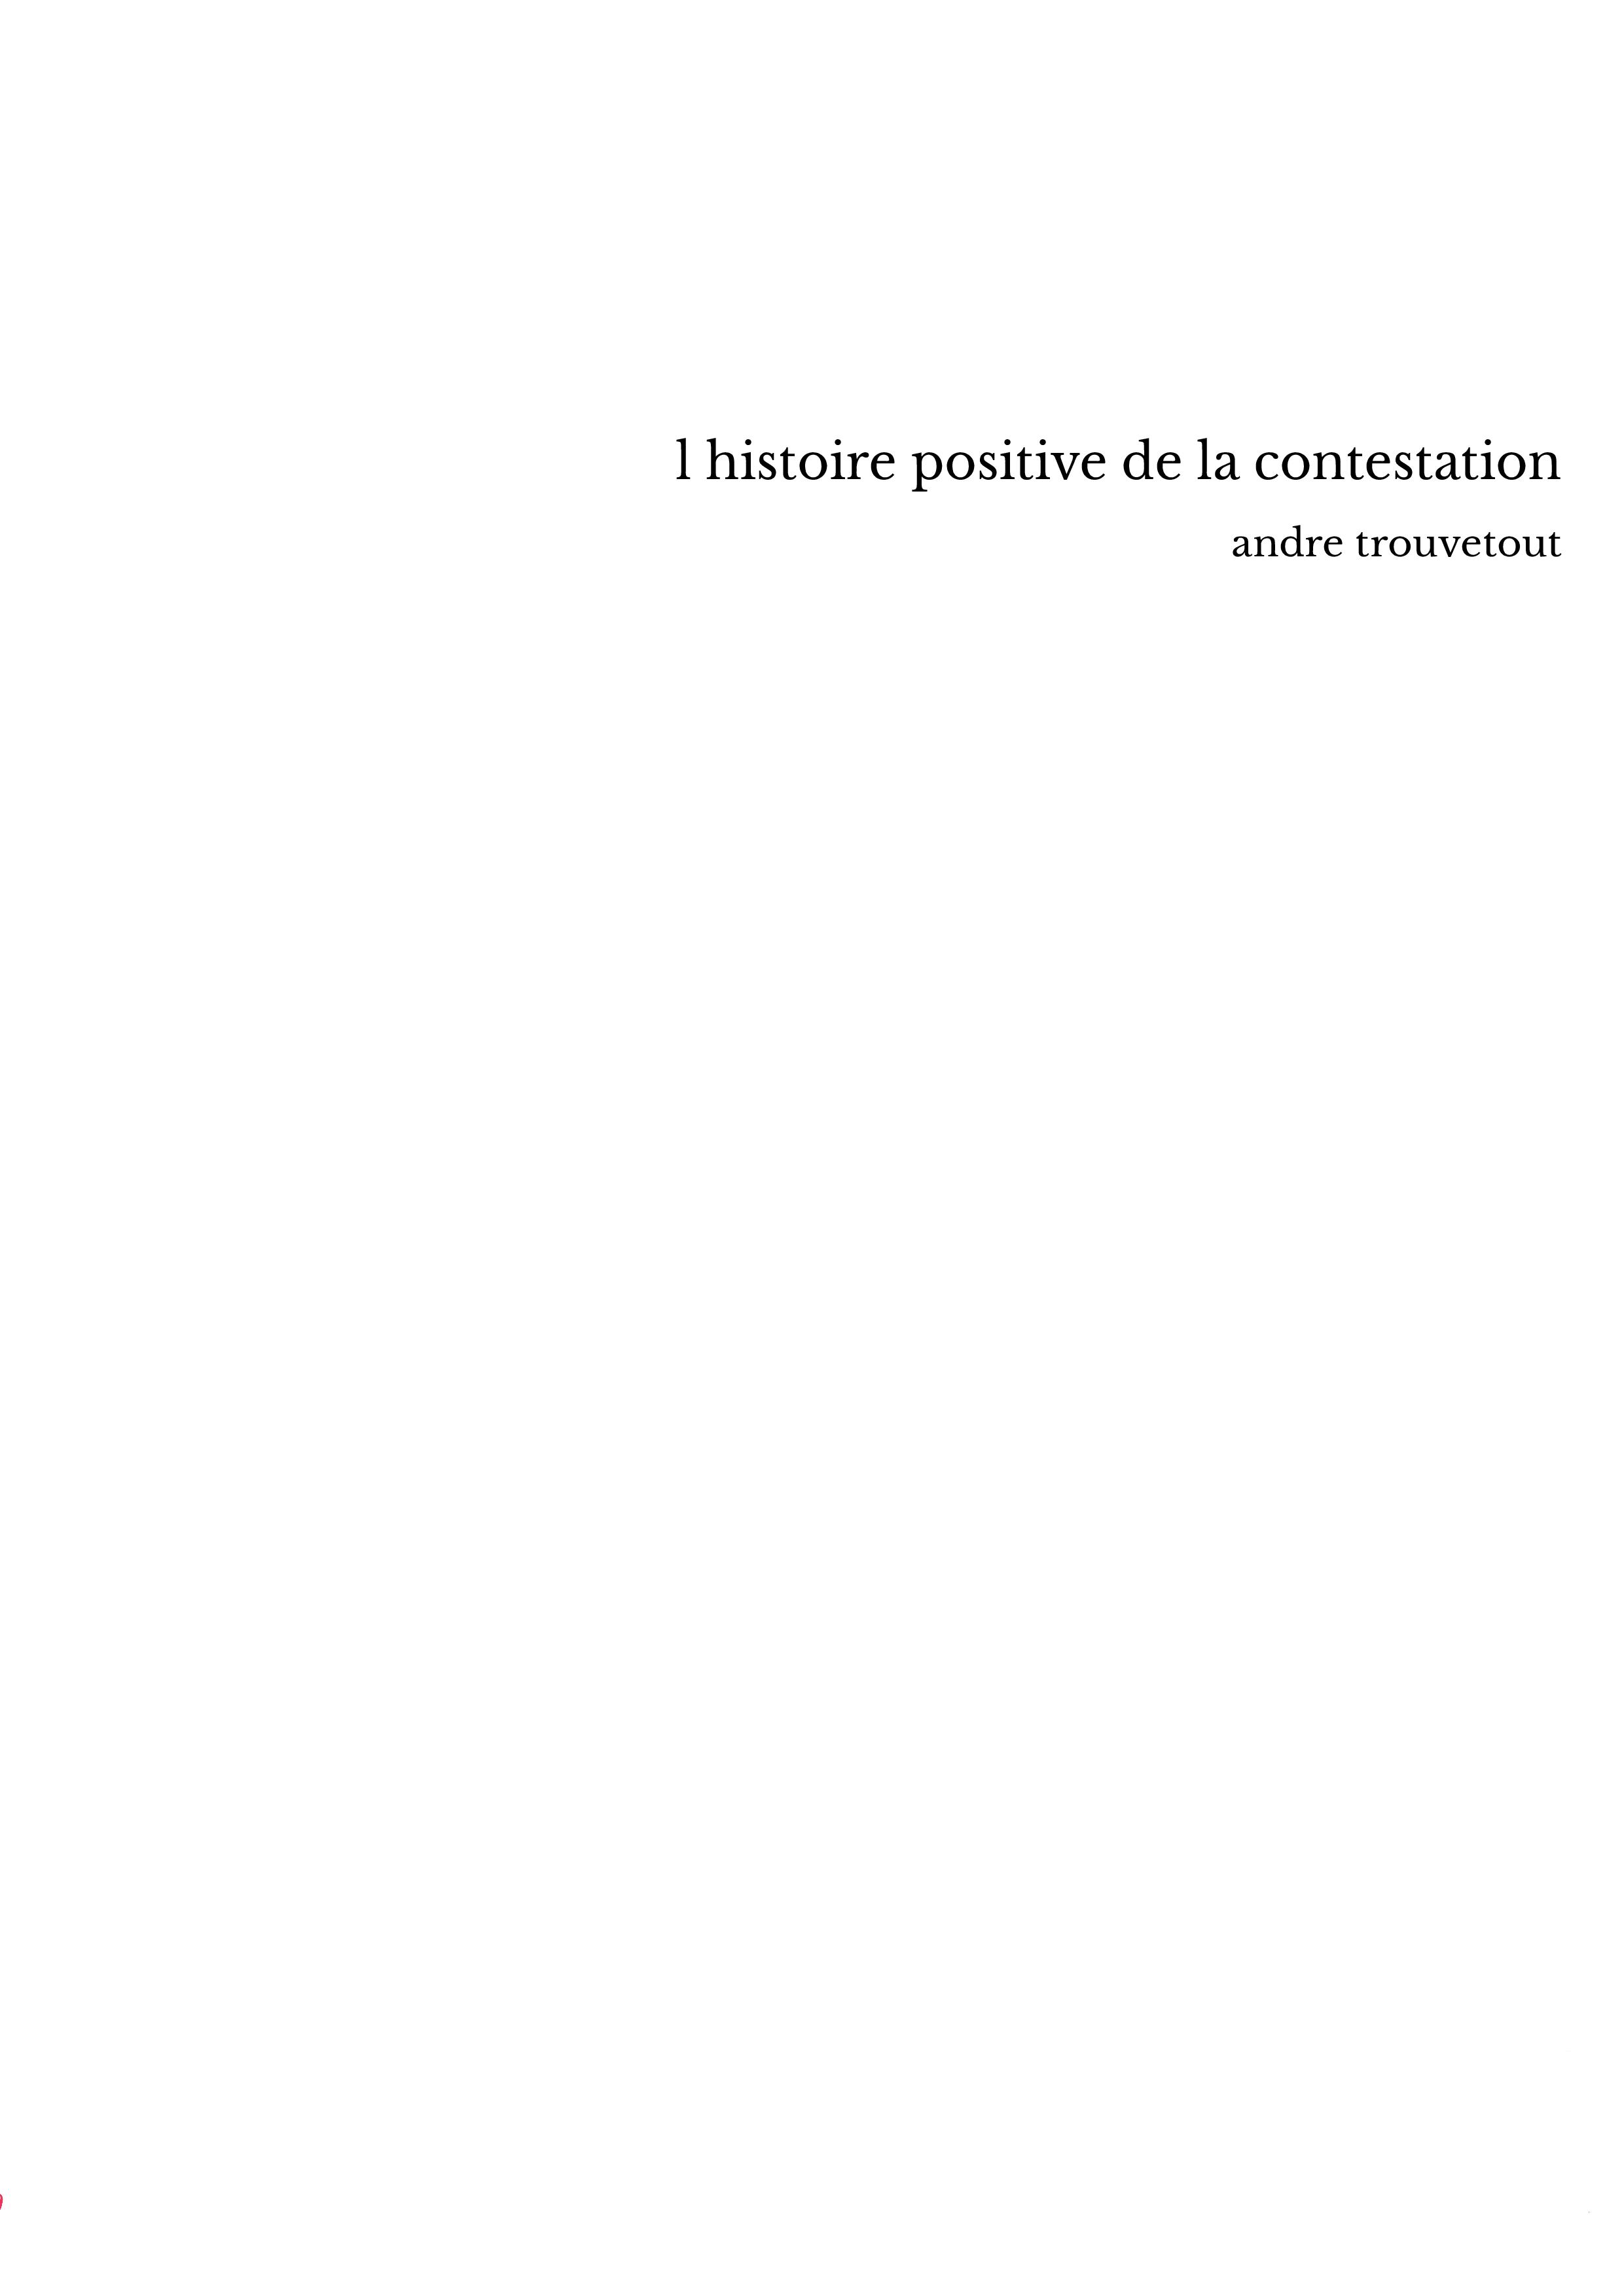 l histoire positive de la contestation